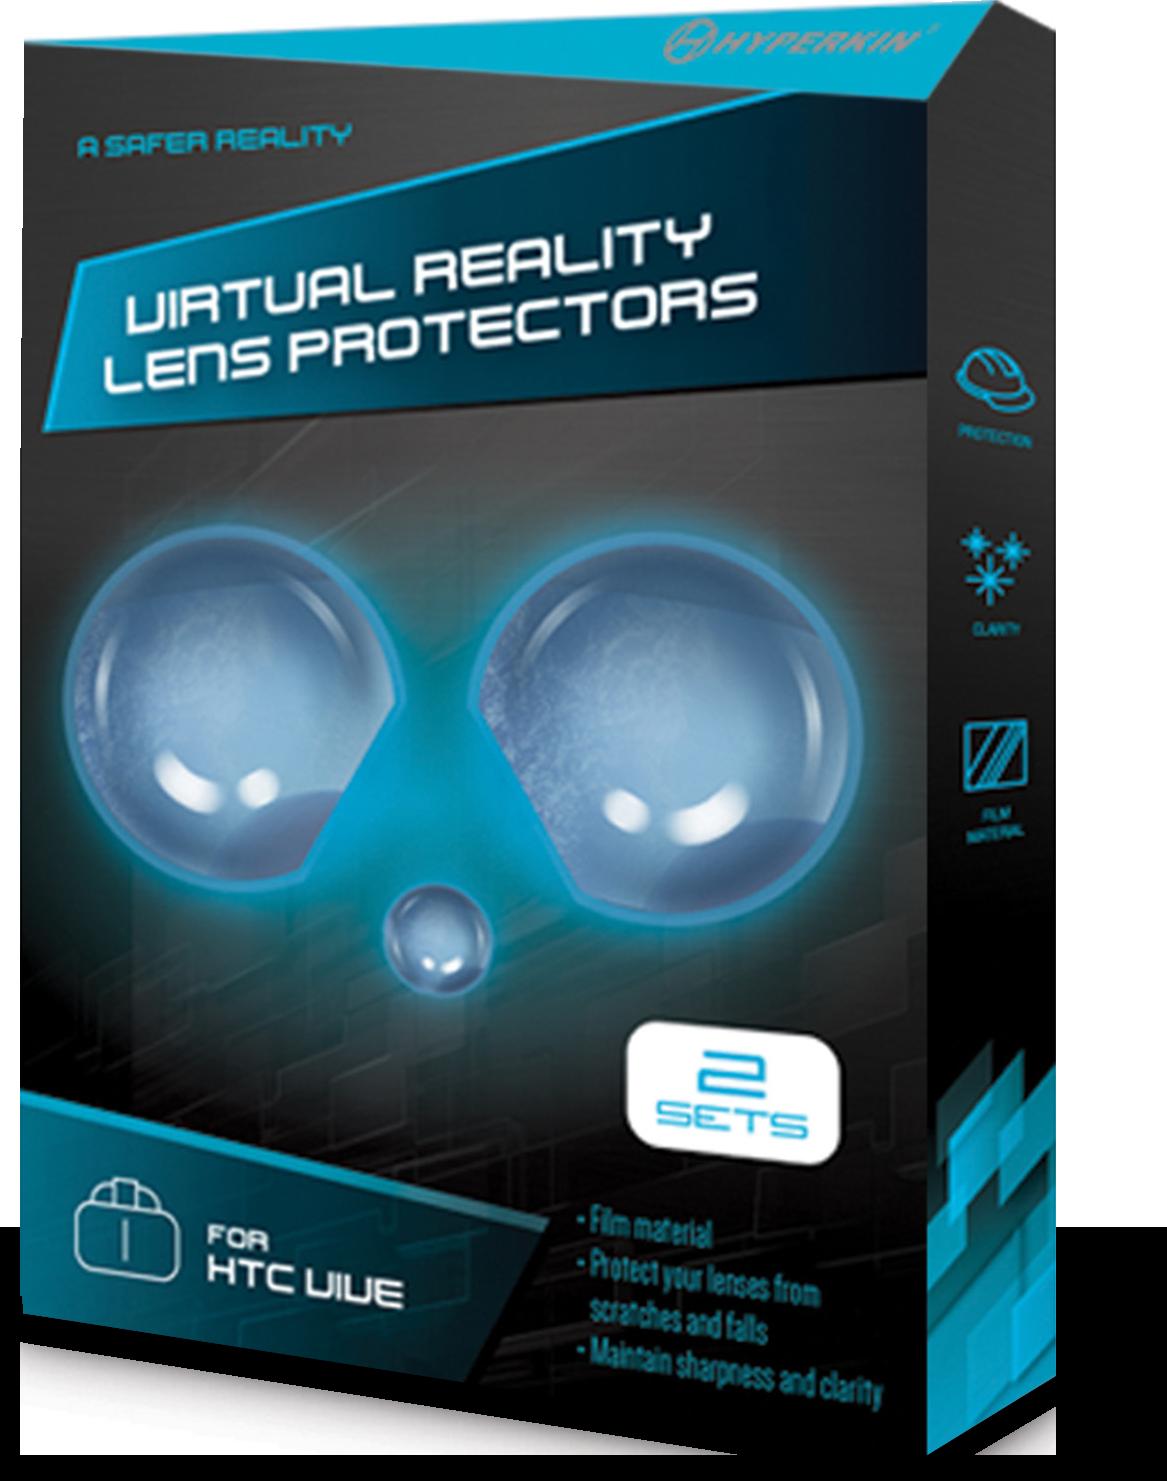 Hyperkin VR Lens Protectors for HTC Vive